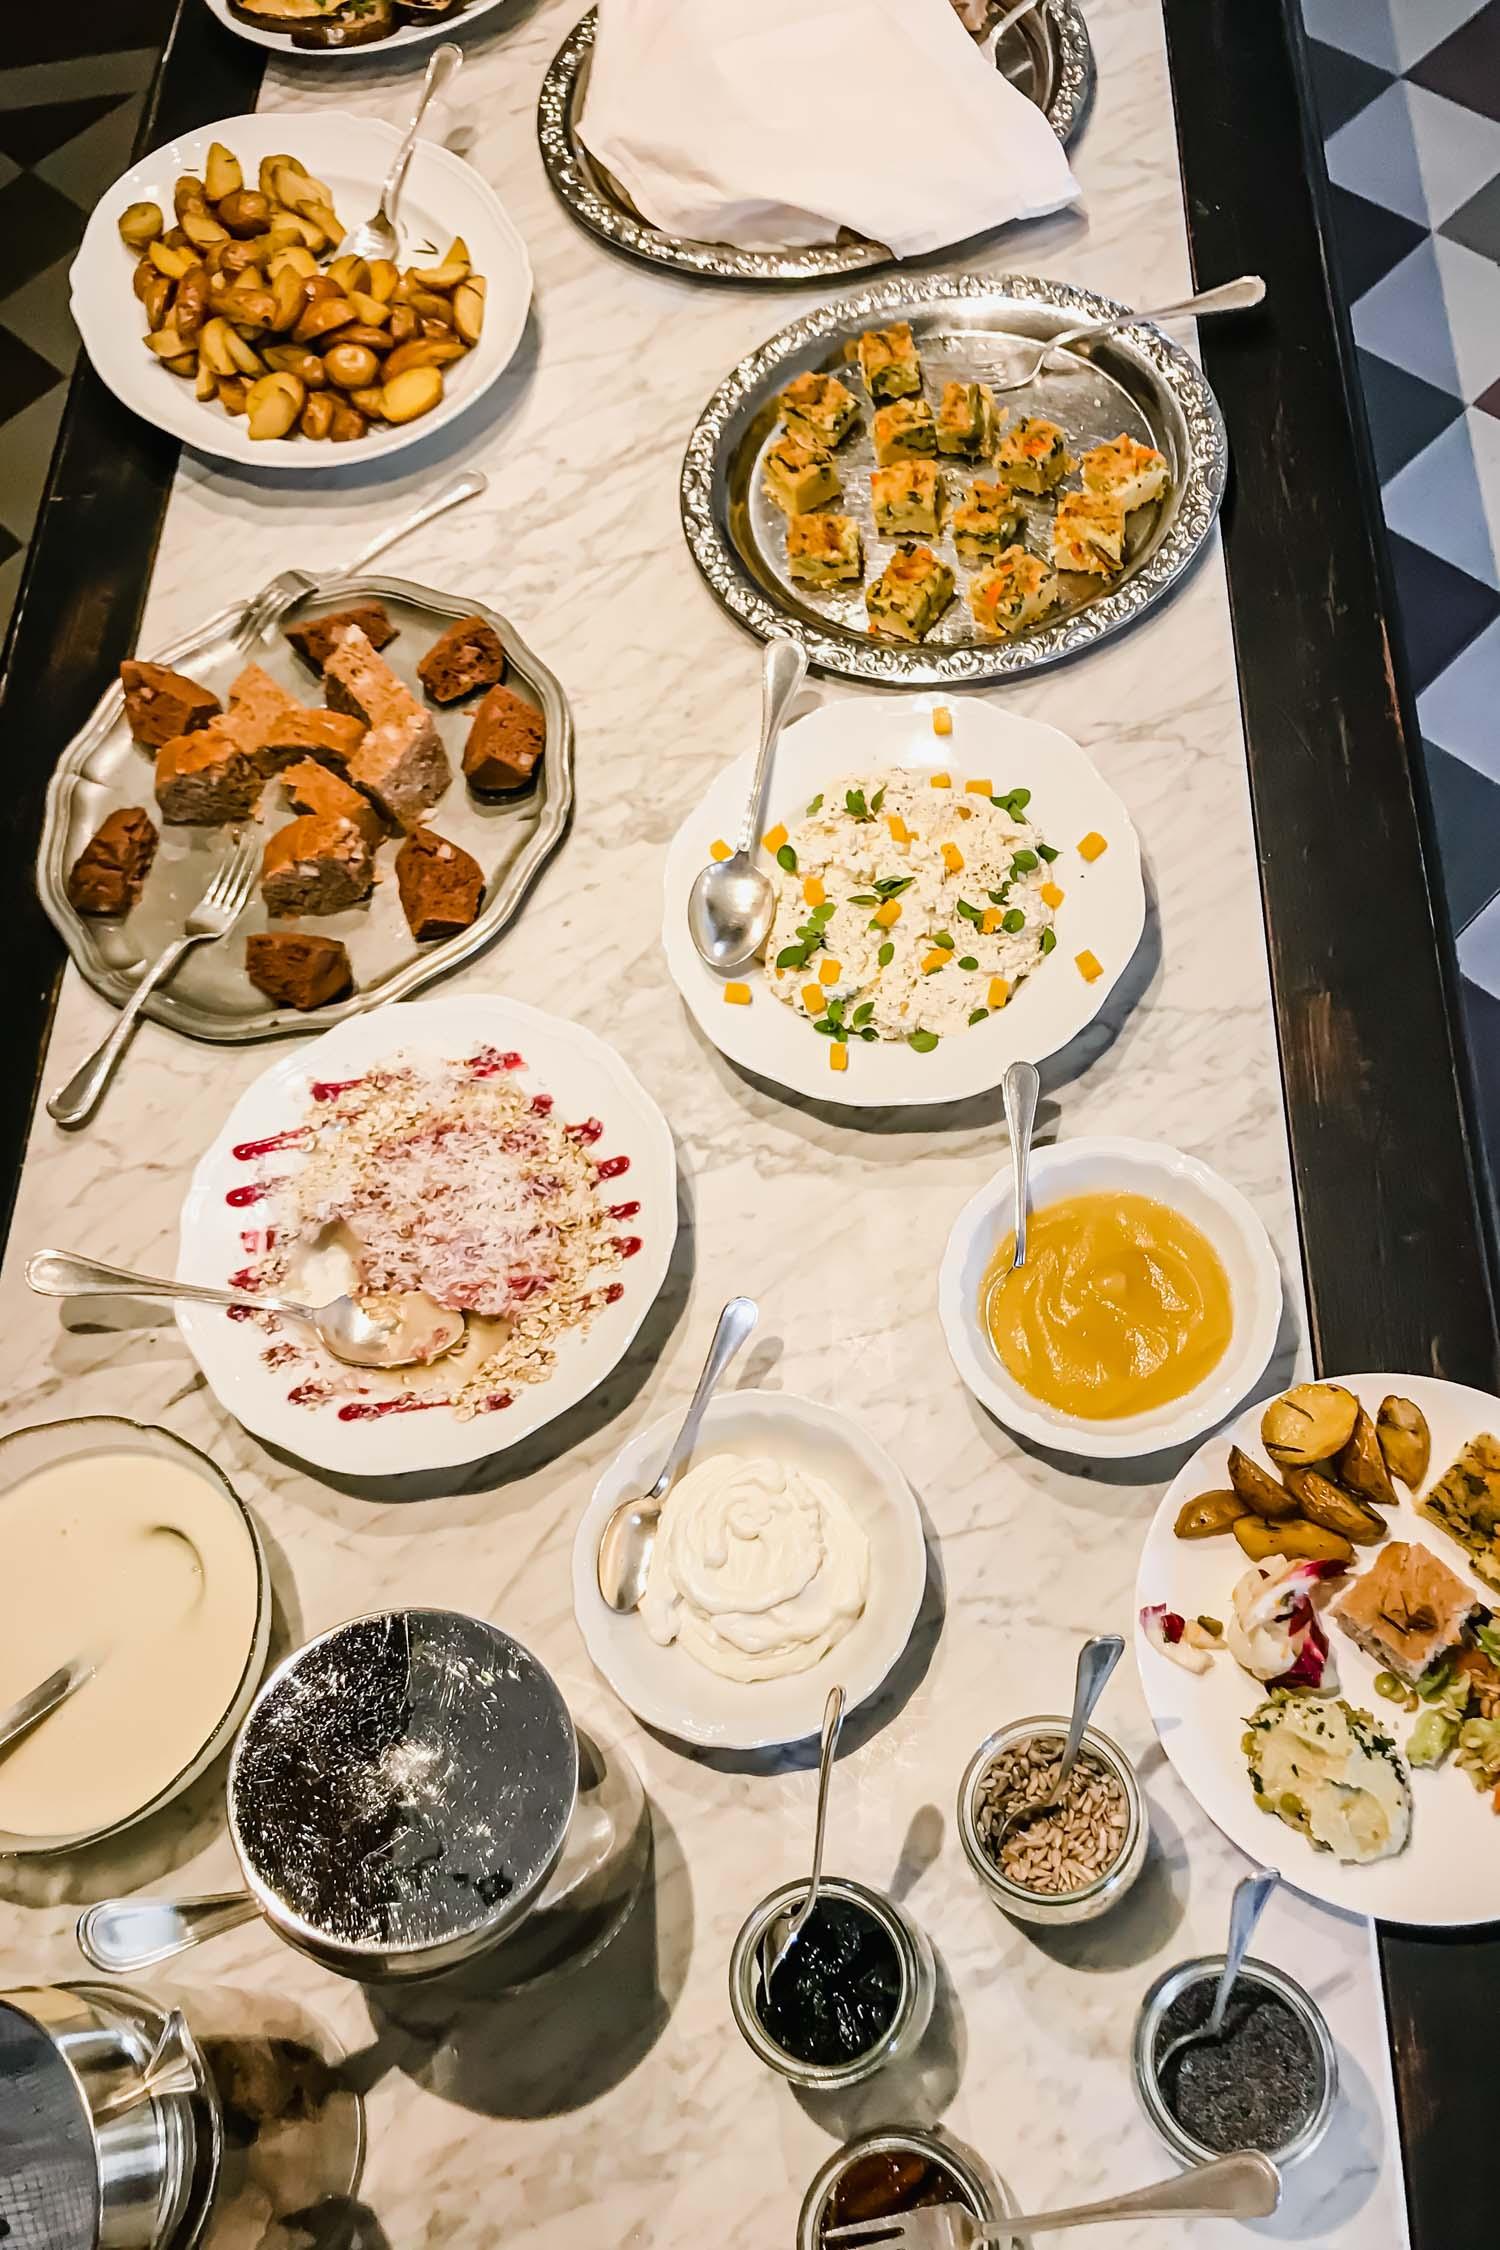 Breakfast at i pini, the organic & vegan Italian farmhouse in Tuscany. #tuscany #travel #italy #italianfarmhouse #olivegroves #organicoliveoil #vineyards #italyinautumn #veganrestaurant #vegantravel #italytravel #veganitaly #vegantuscany #veganhotel #ecotourism #organichotel #veganhotel #veganretreat #veganbedandbreakfast #sangimignano